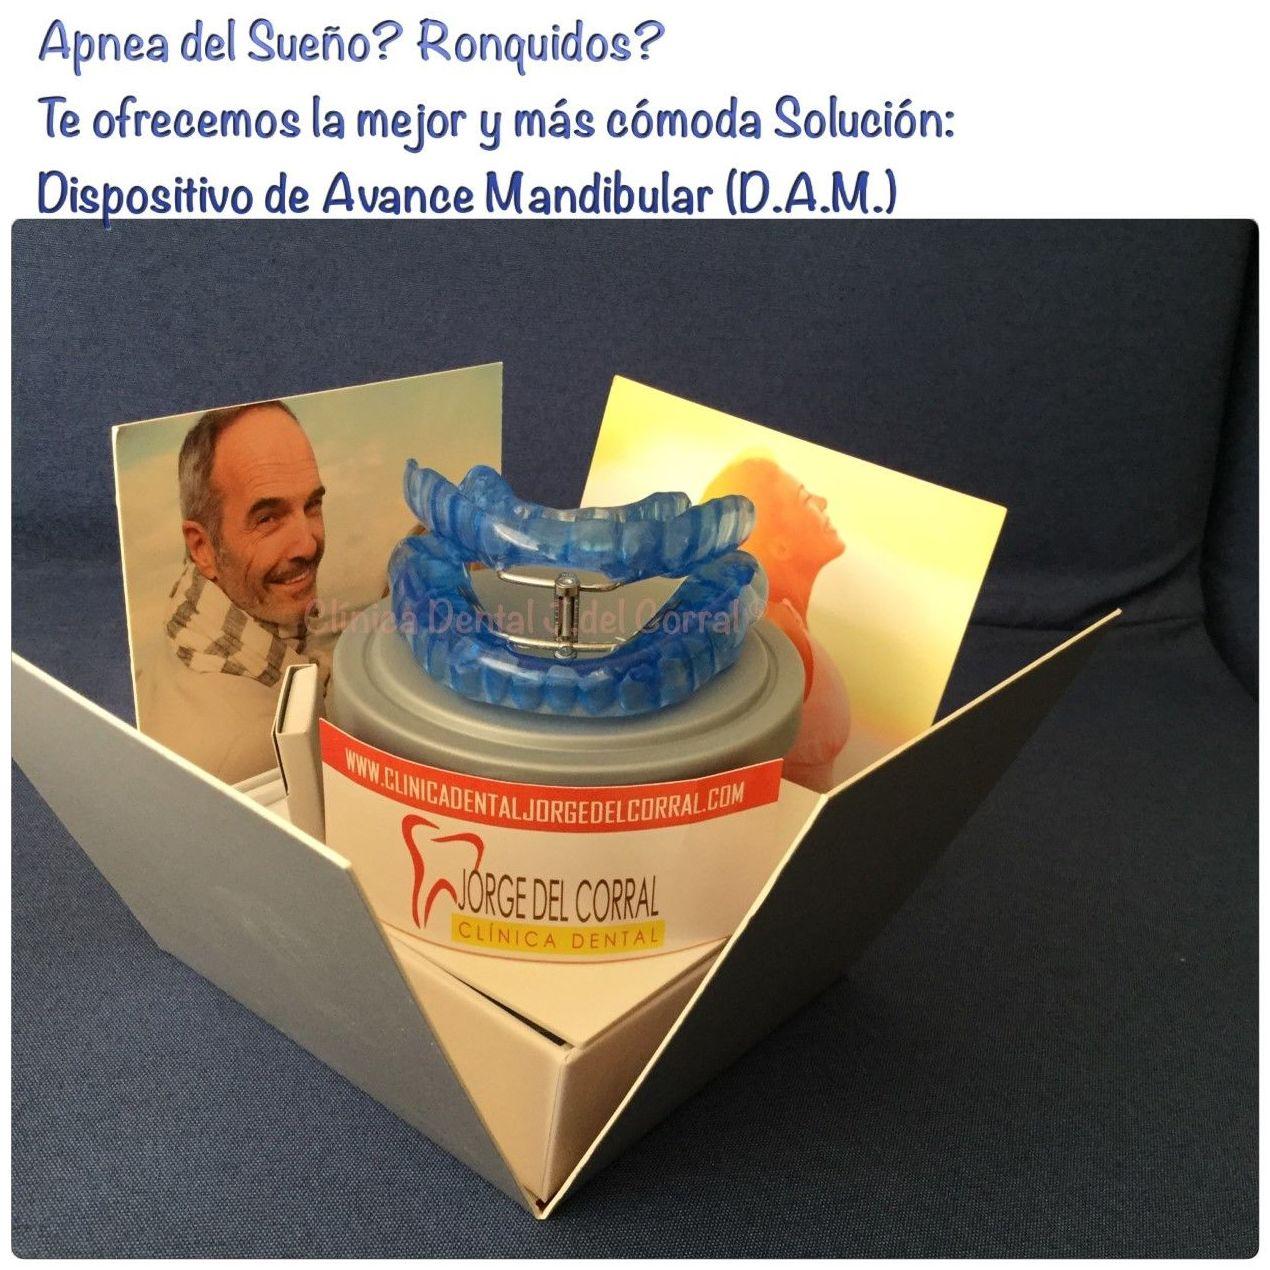 prótesis apnea del sueño,apnea del sueño,dispositivo de avance mandibular,(D.A.M),dam,prótesis antironquidos,apnea del sueño,aparato antironquidos.